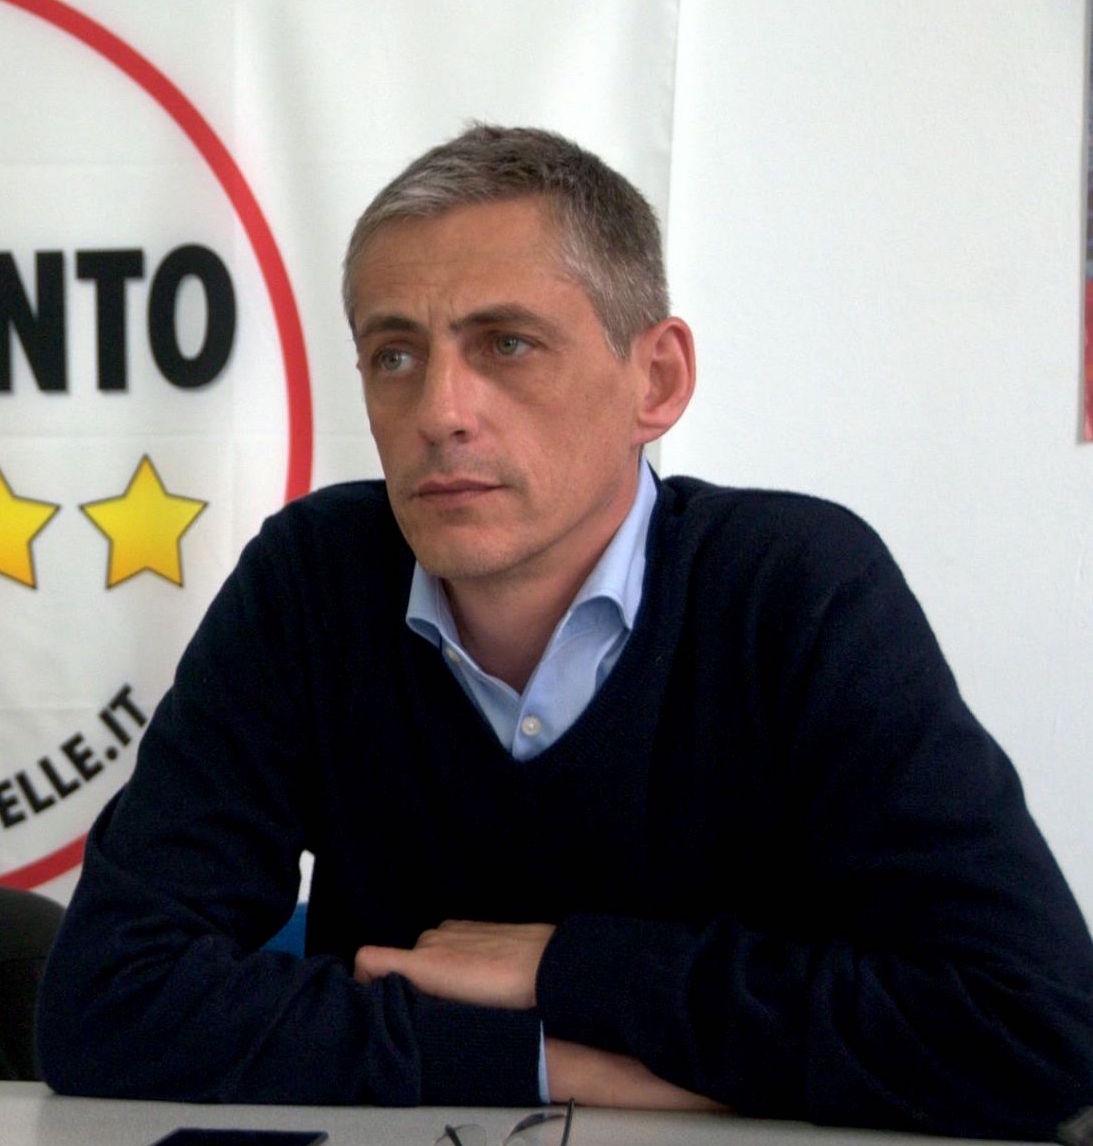 Alberto Airola